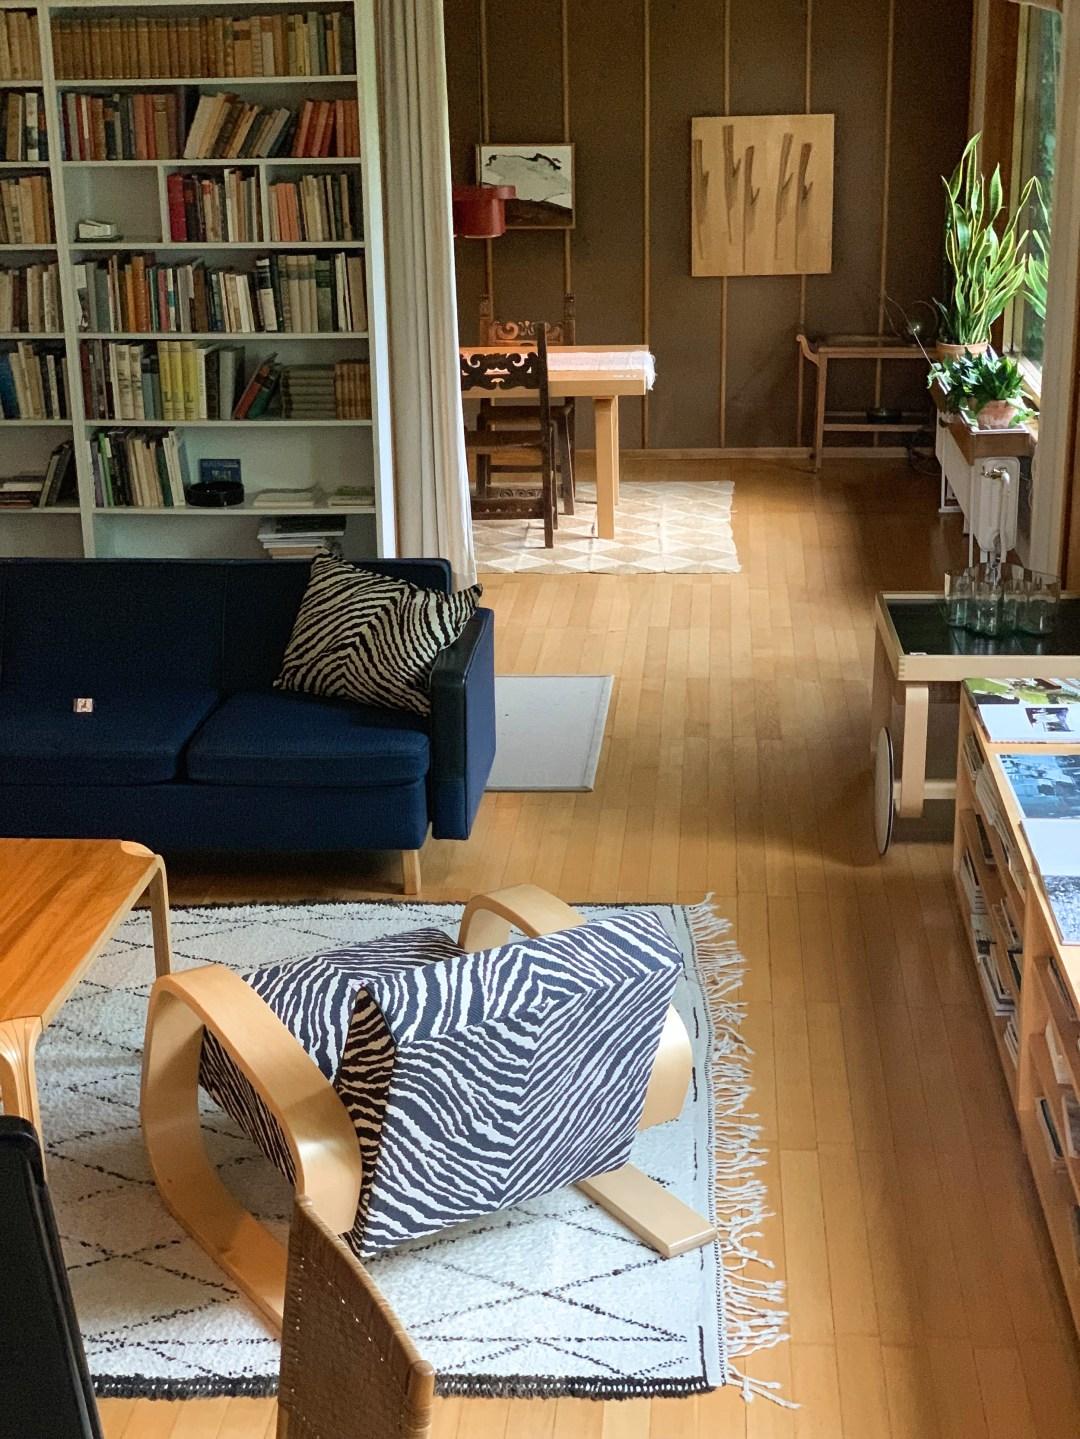 A modernist living room